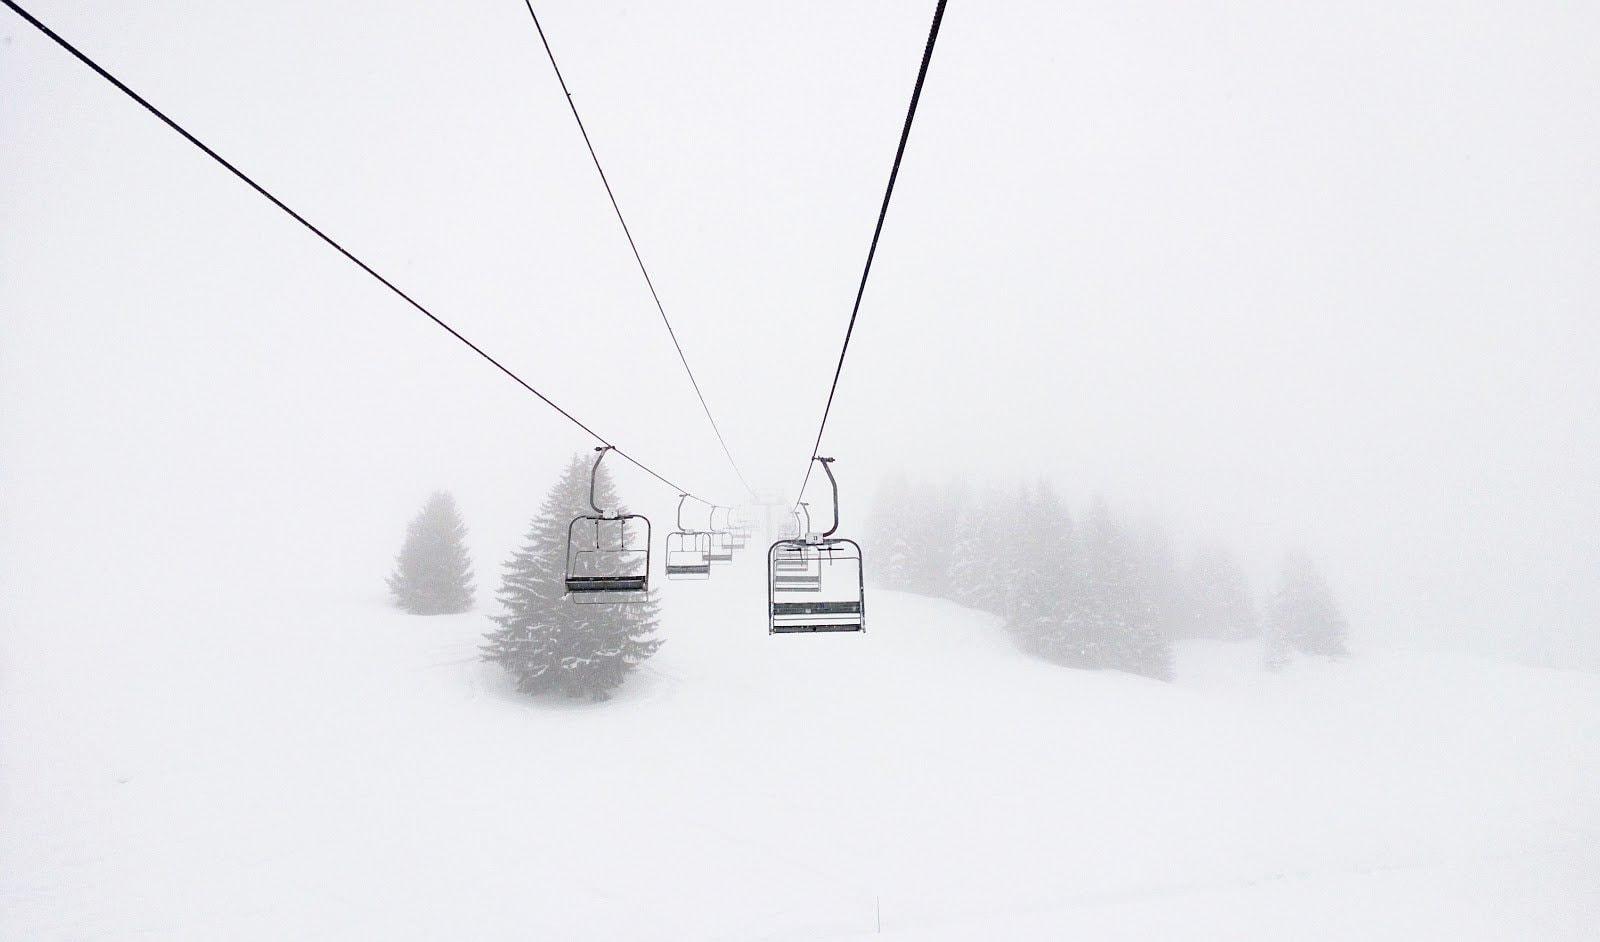 Chair lifts on a foggy ski slope by Geoffrey Arduini